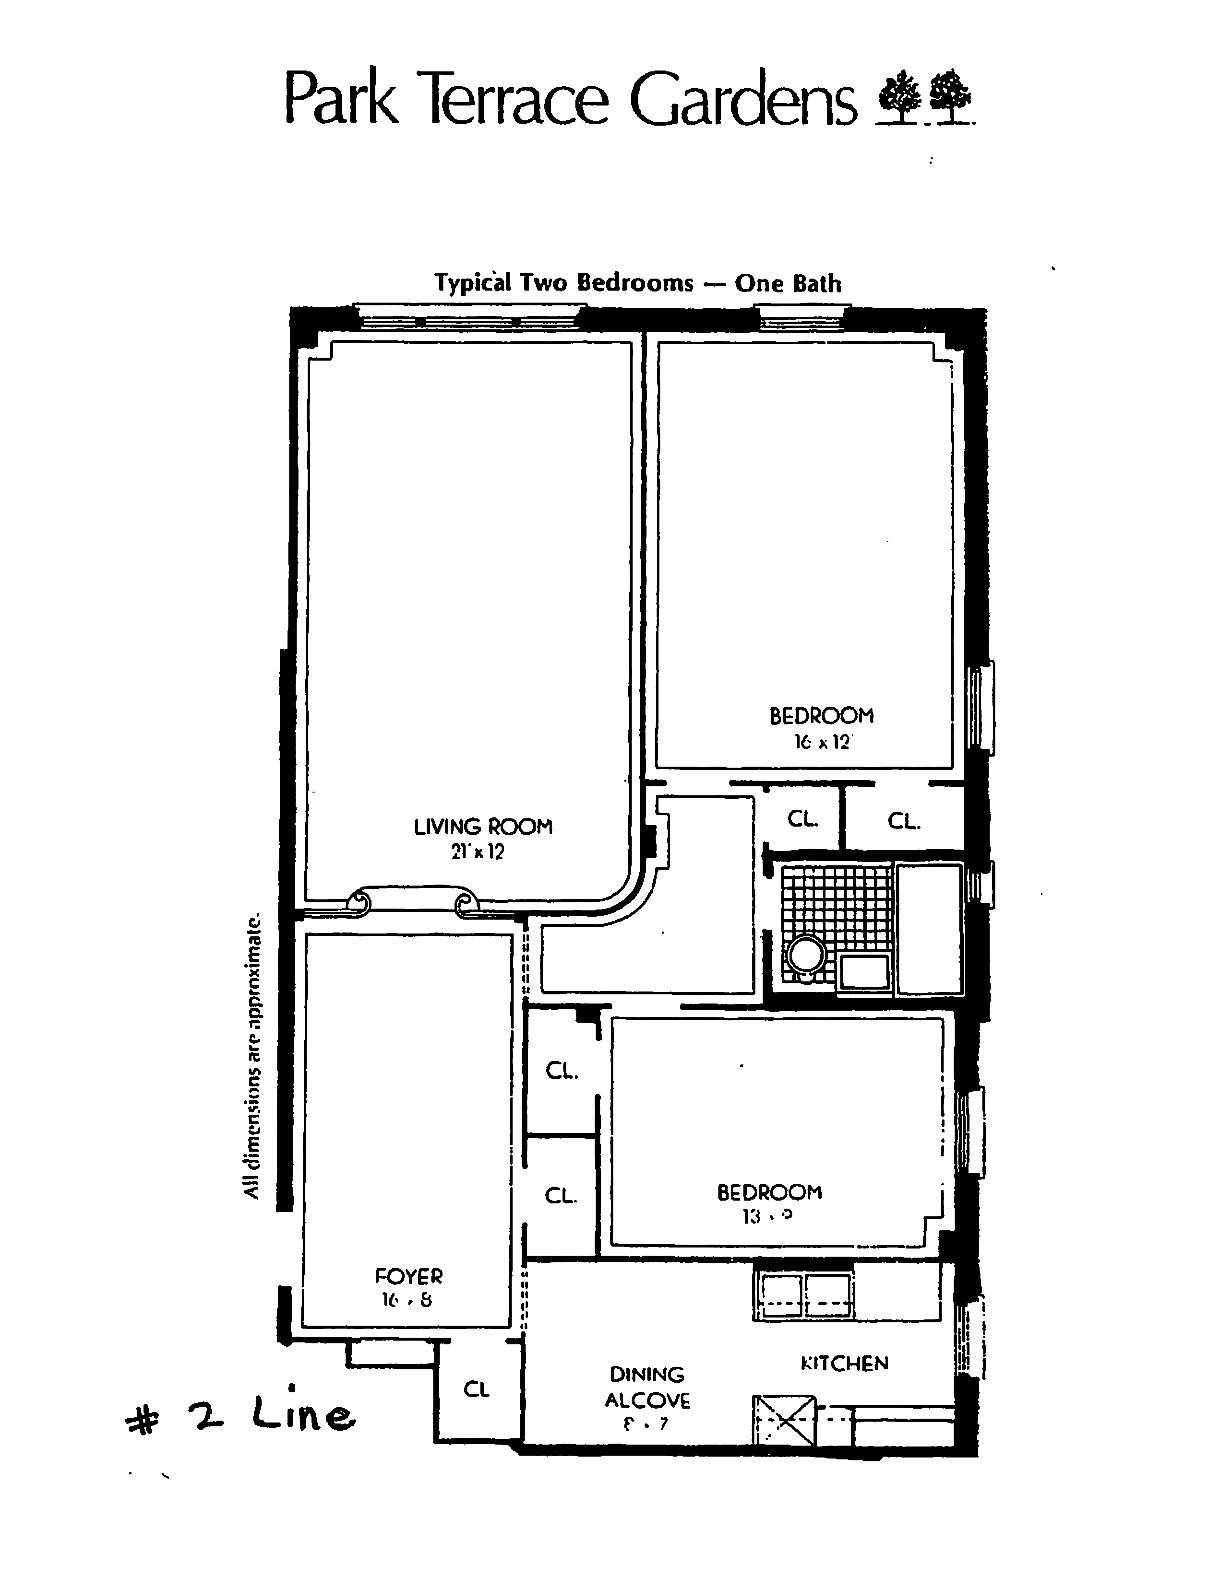 60 park terrace west a42 co op apartment sale in inwood for 60 park terrace west